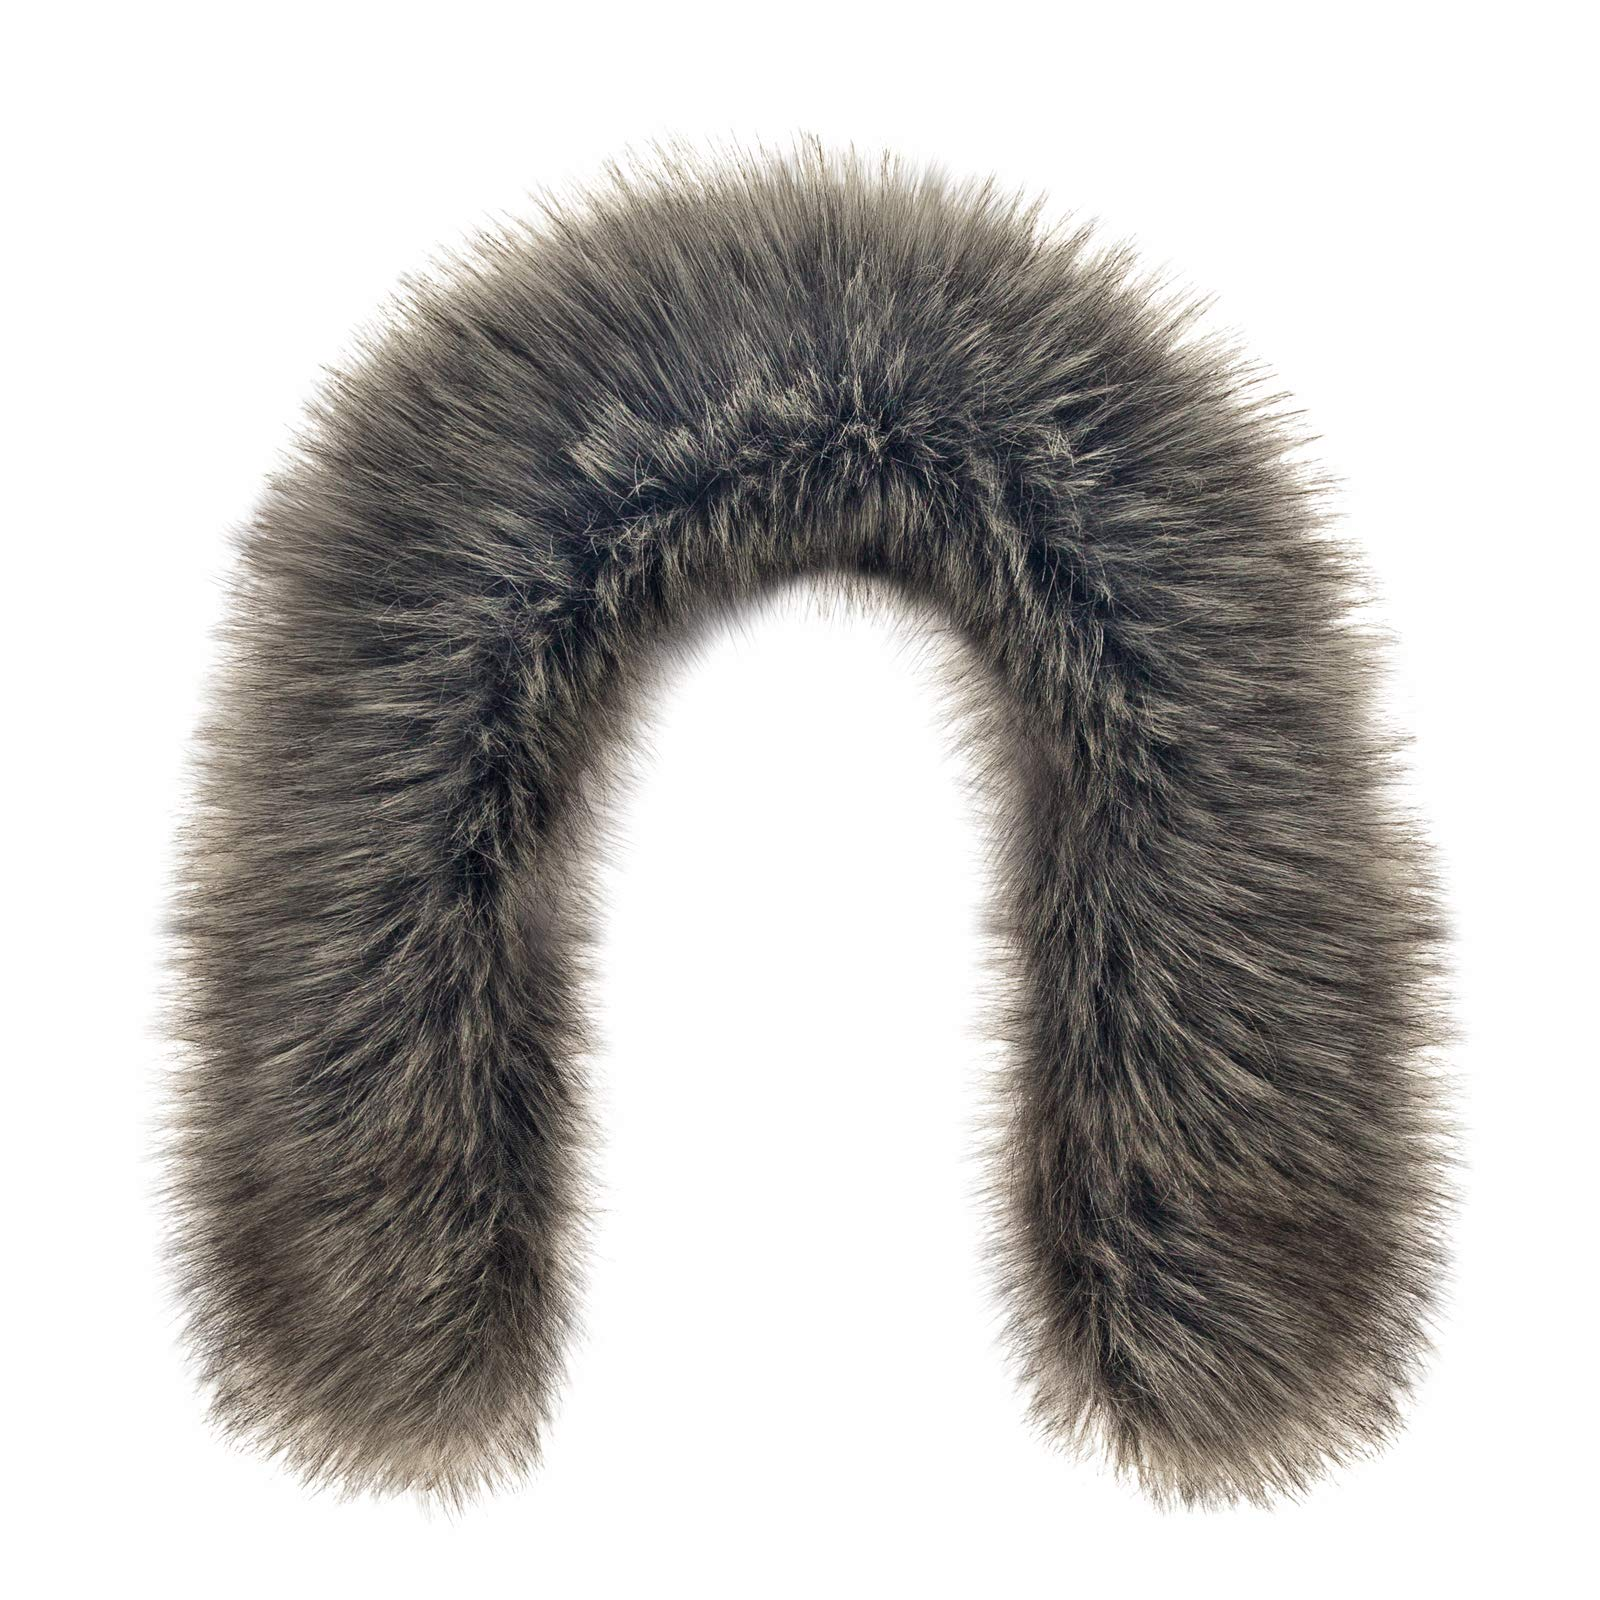 Futrzane Trim Hood Faux Fake Fur Hood Winter for Jacket Ski Collar Wrap Shawl (XS, Steel)